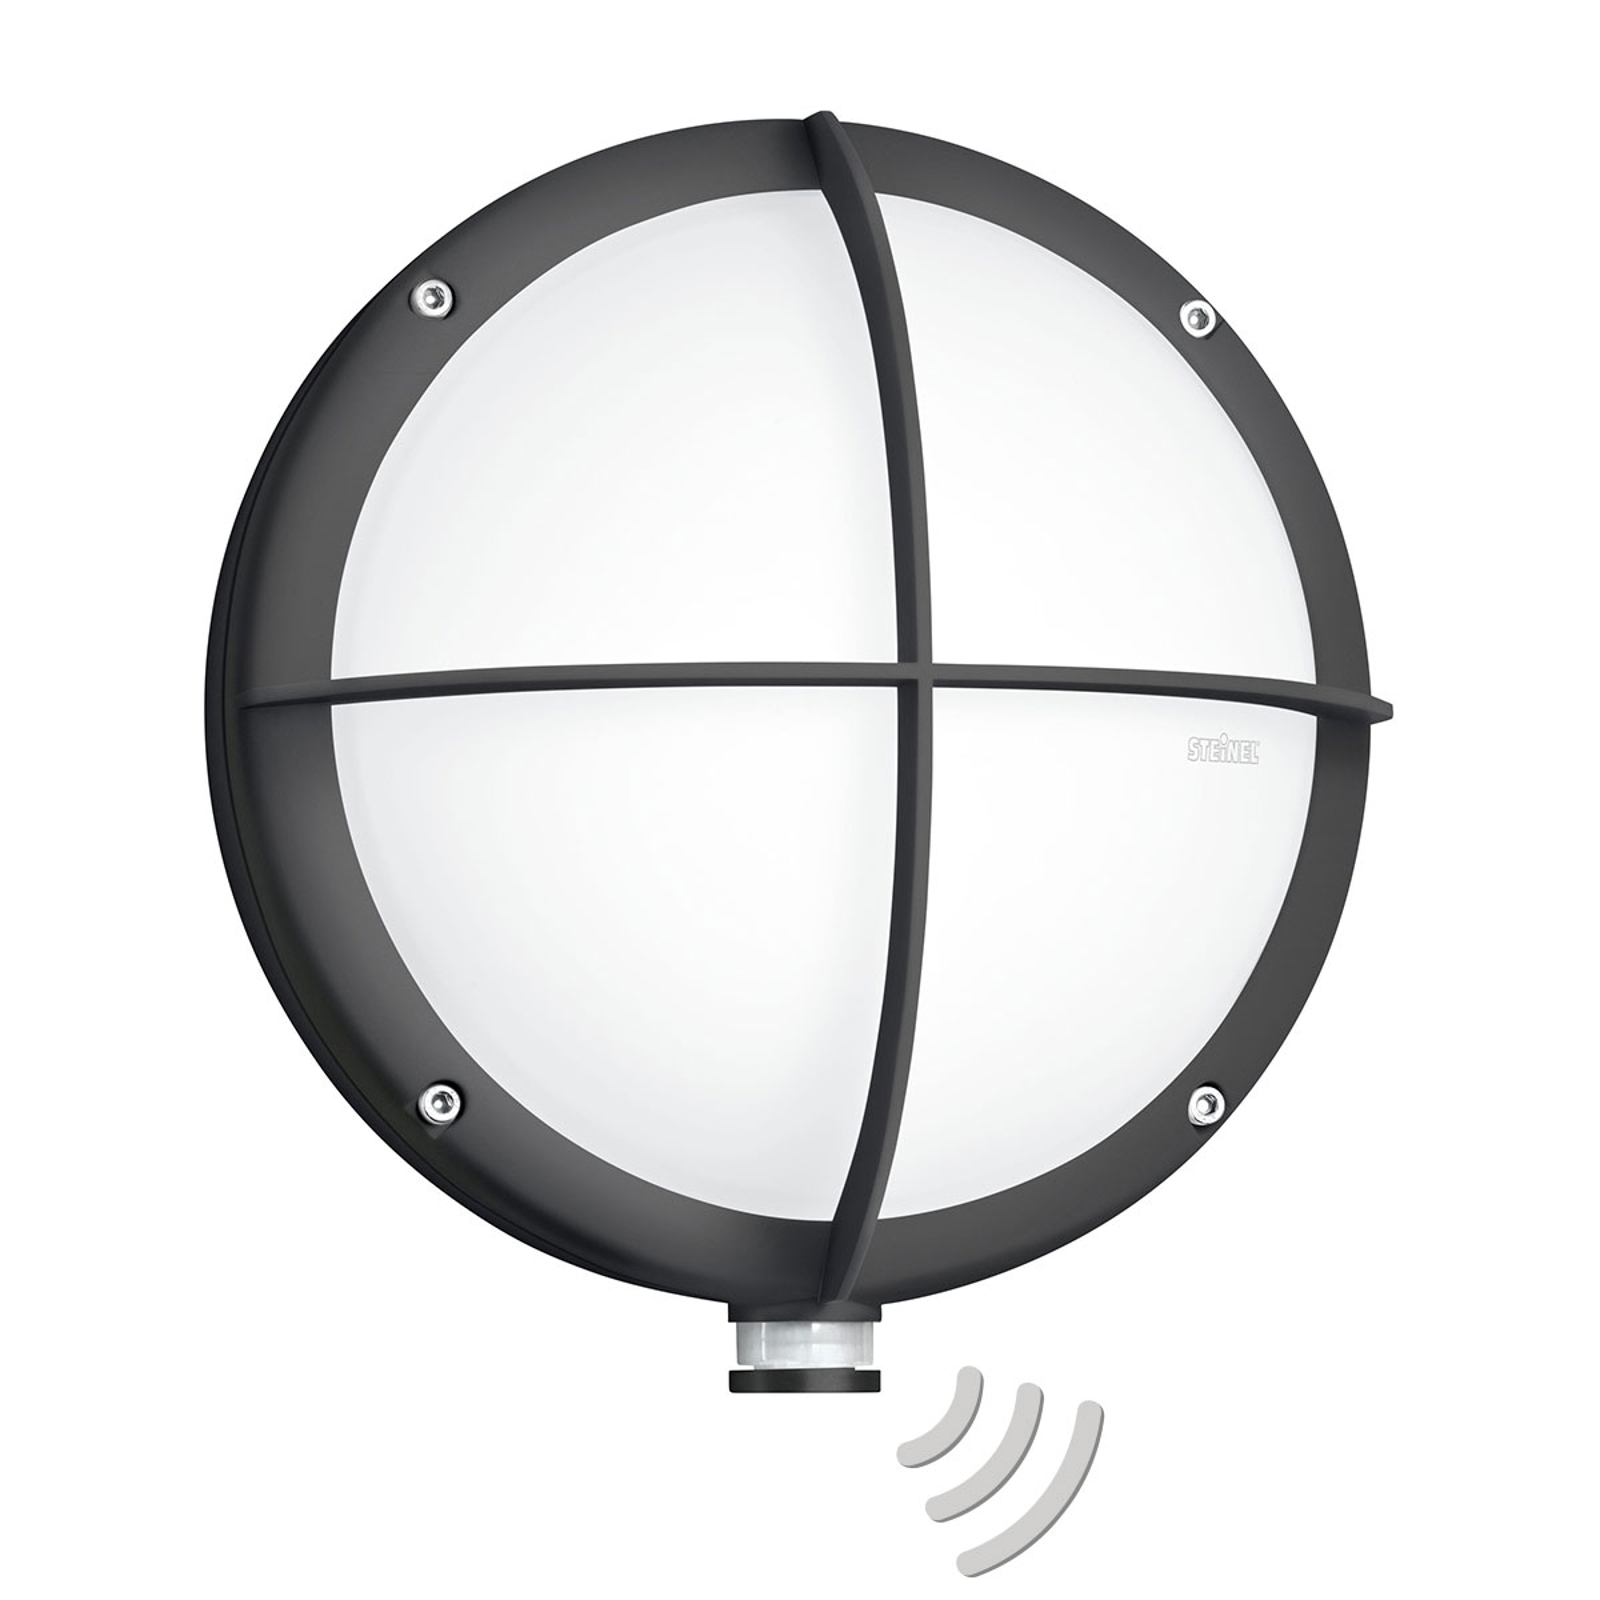 STEINEL L 331 LED-Außenwandleuchte Sensor, Gitter